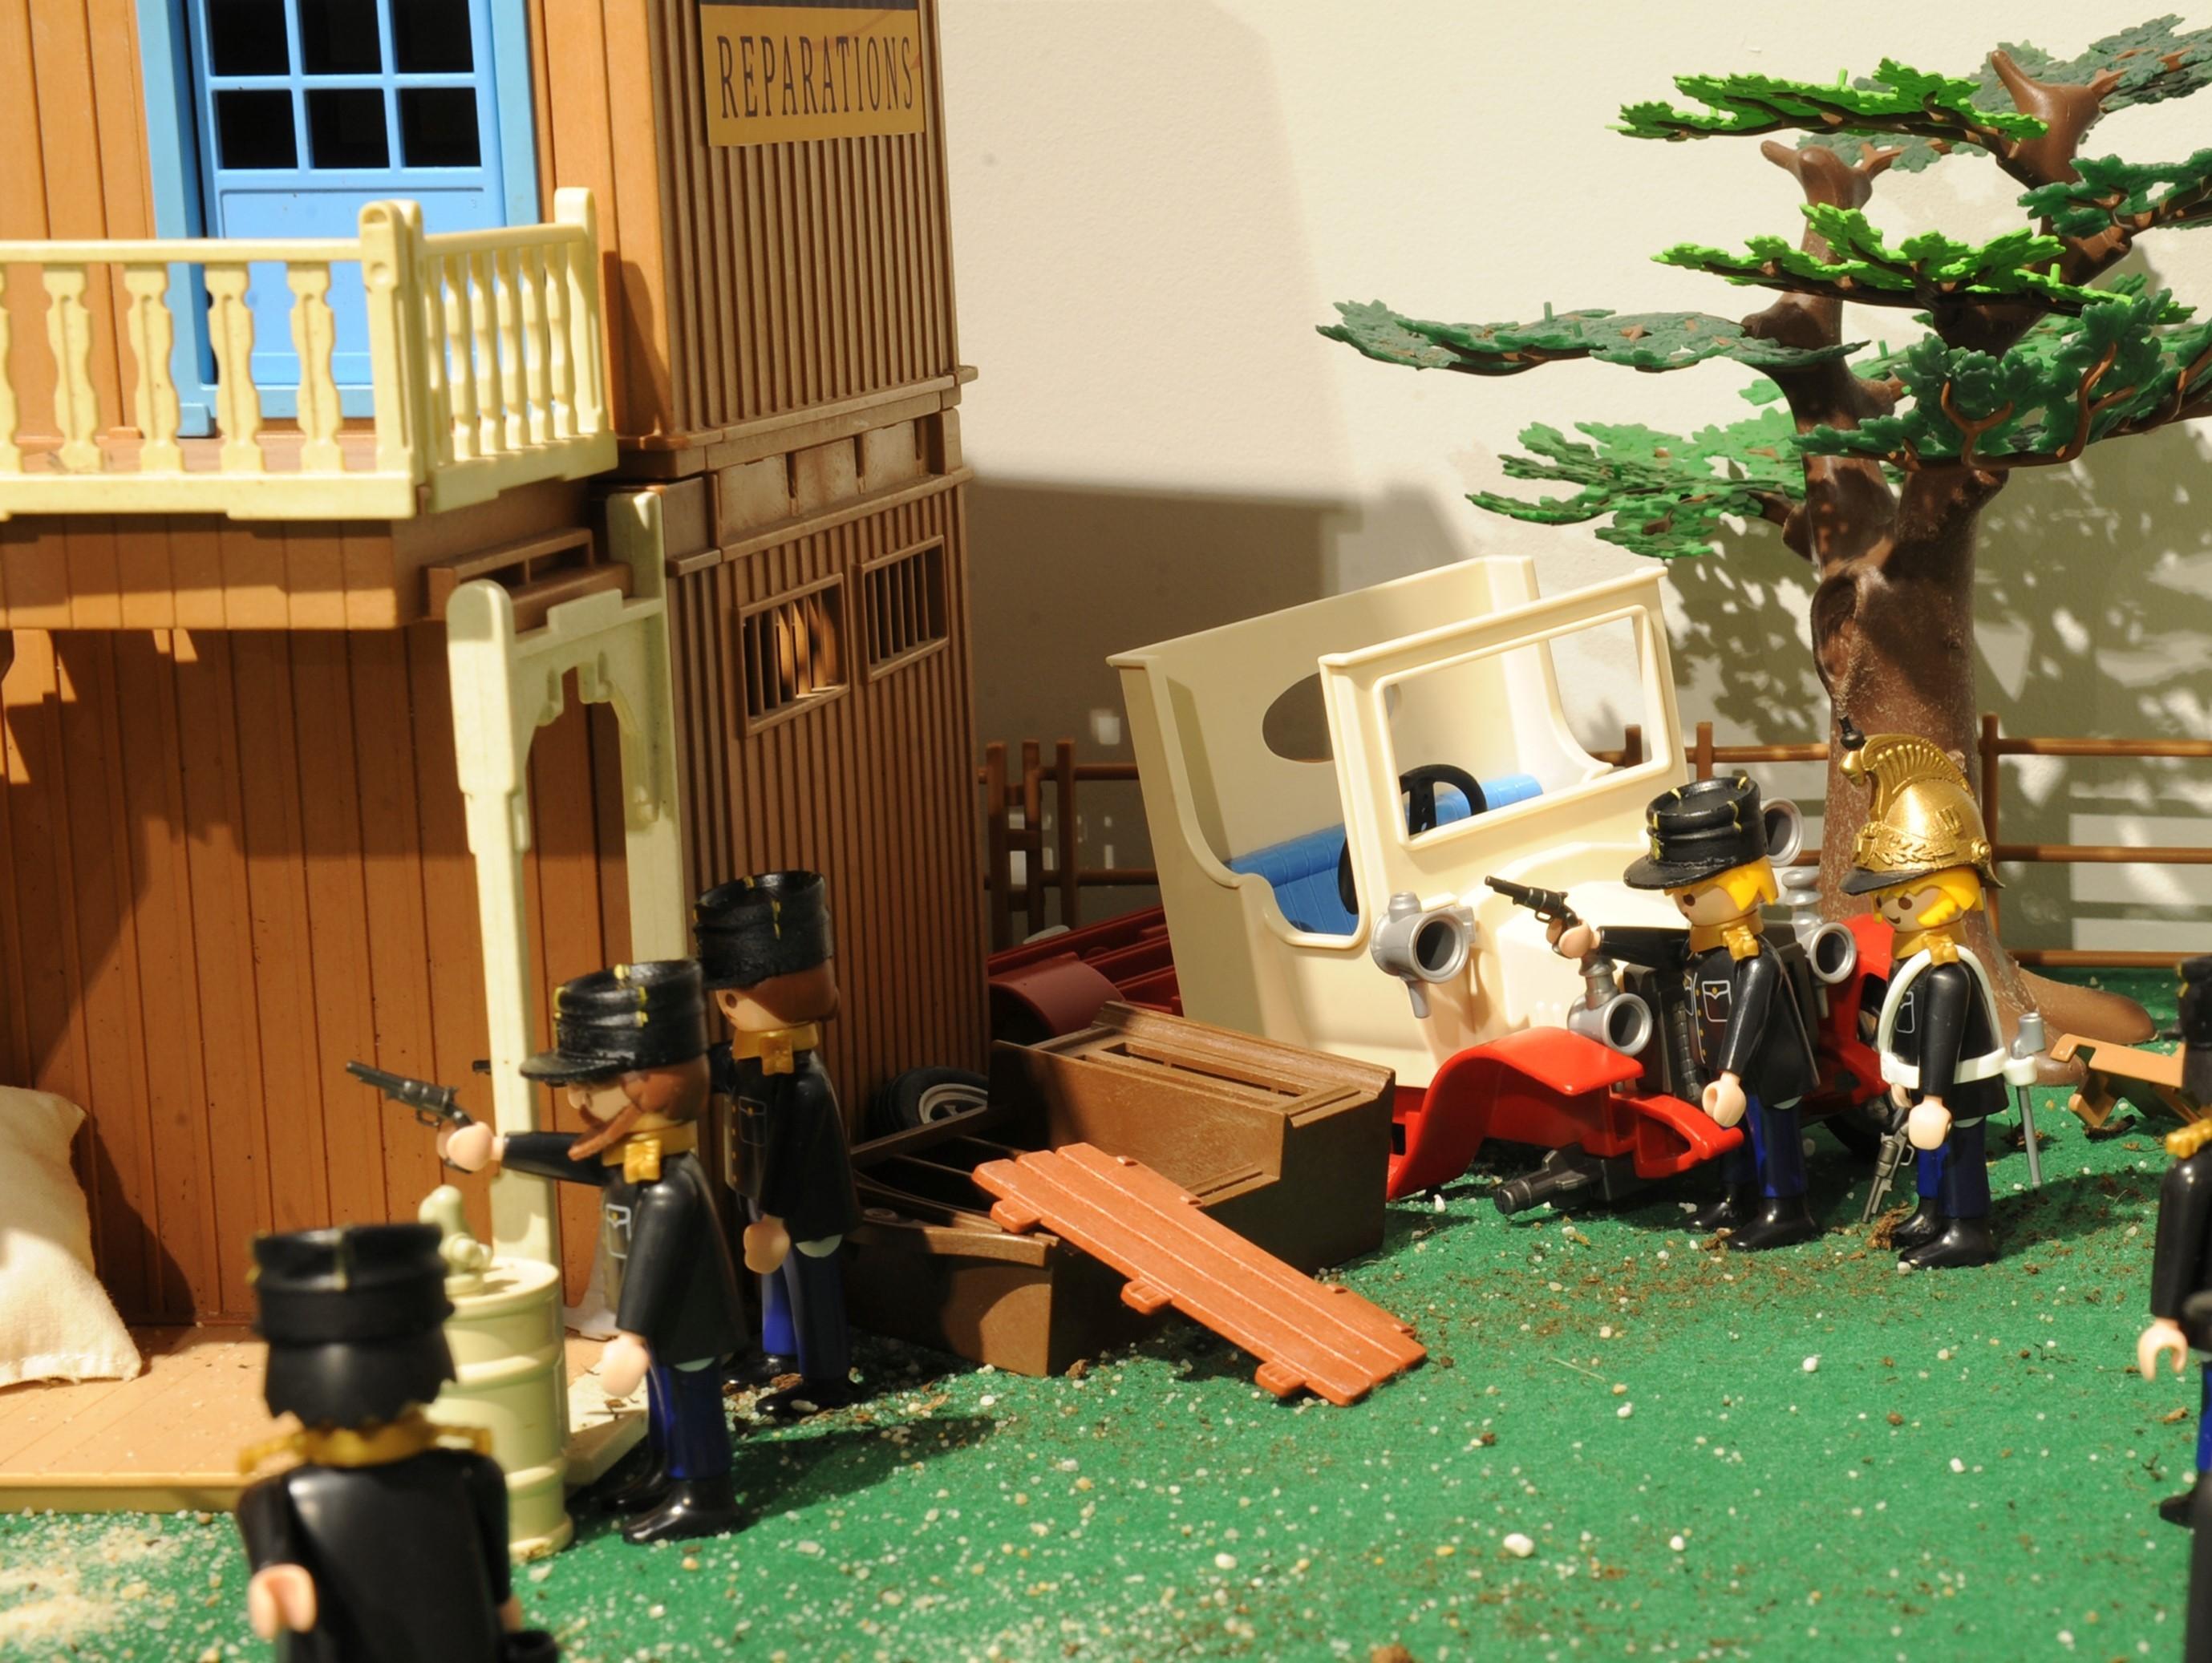 Exposition playmobil gendarmerie - arrestation de Bonnot en 1912